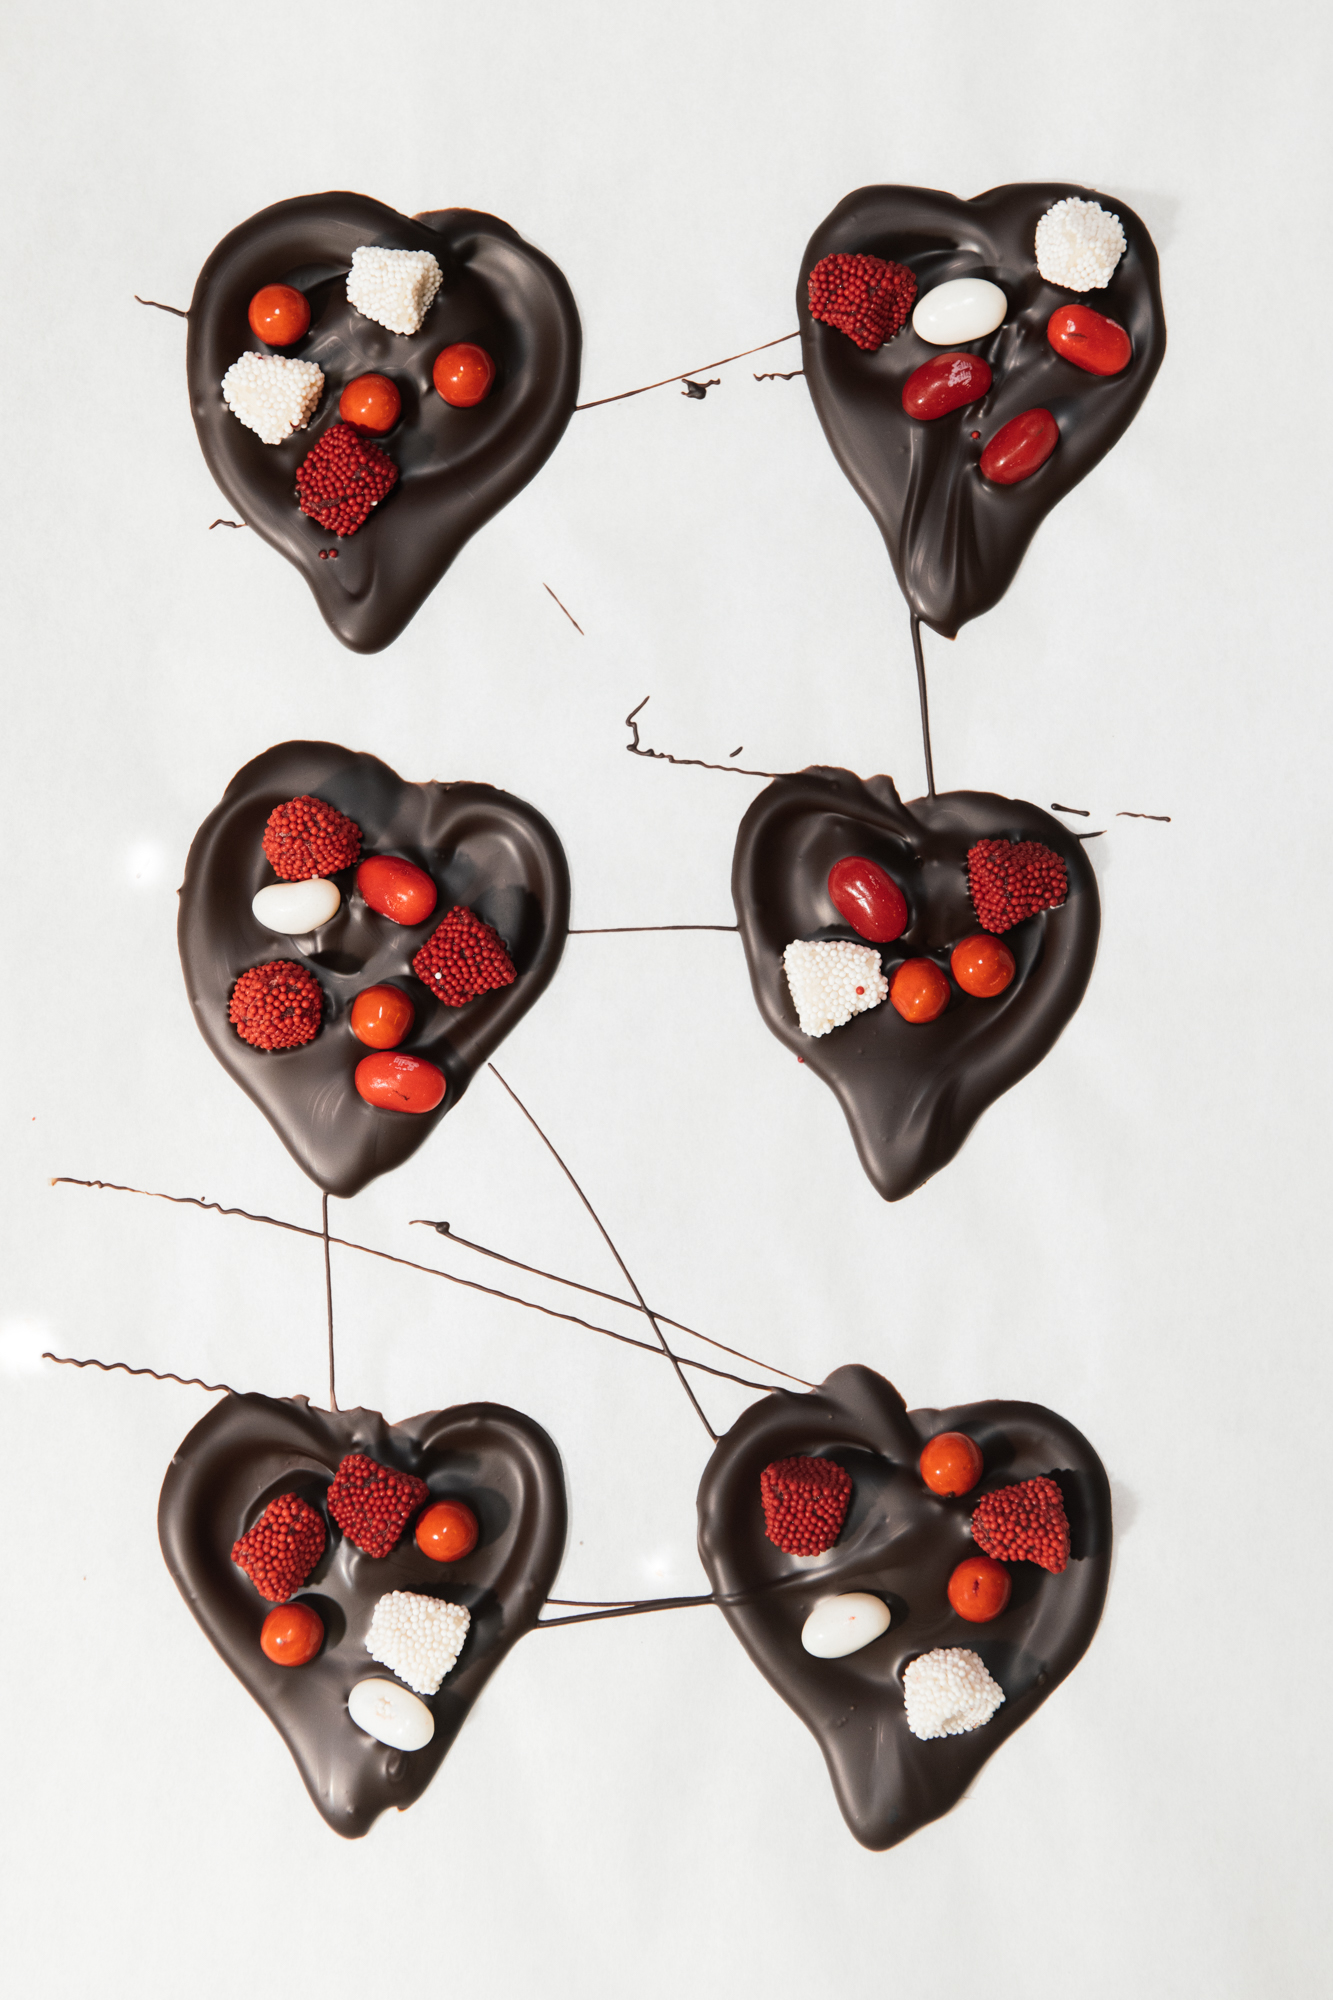 the heart chocolates to go inside the chocolate box